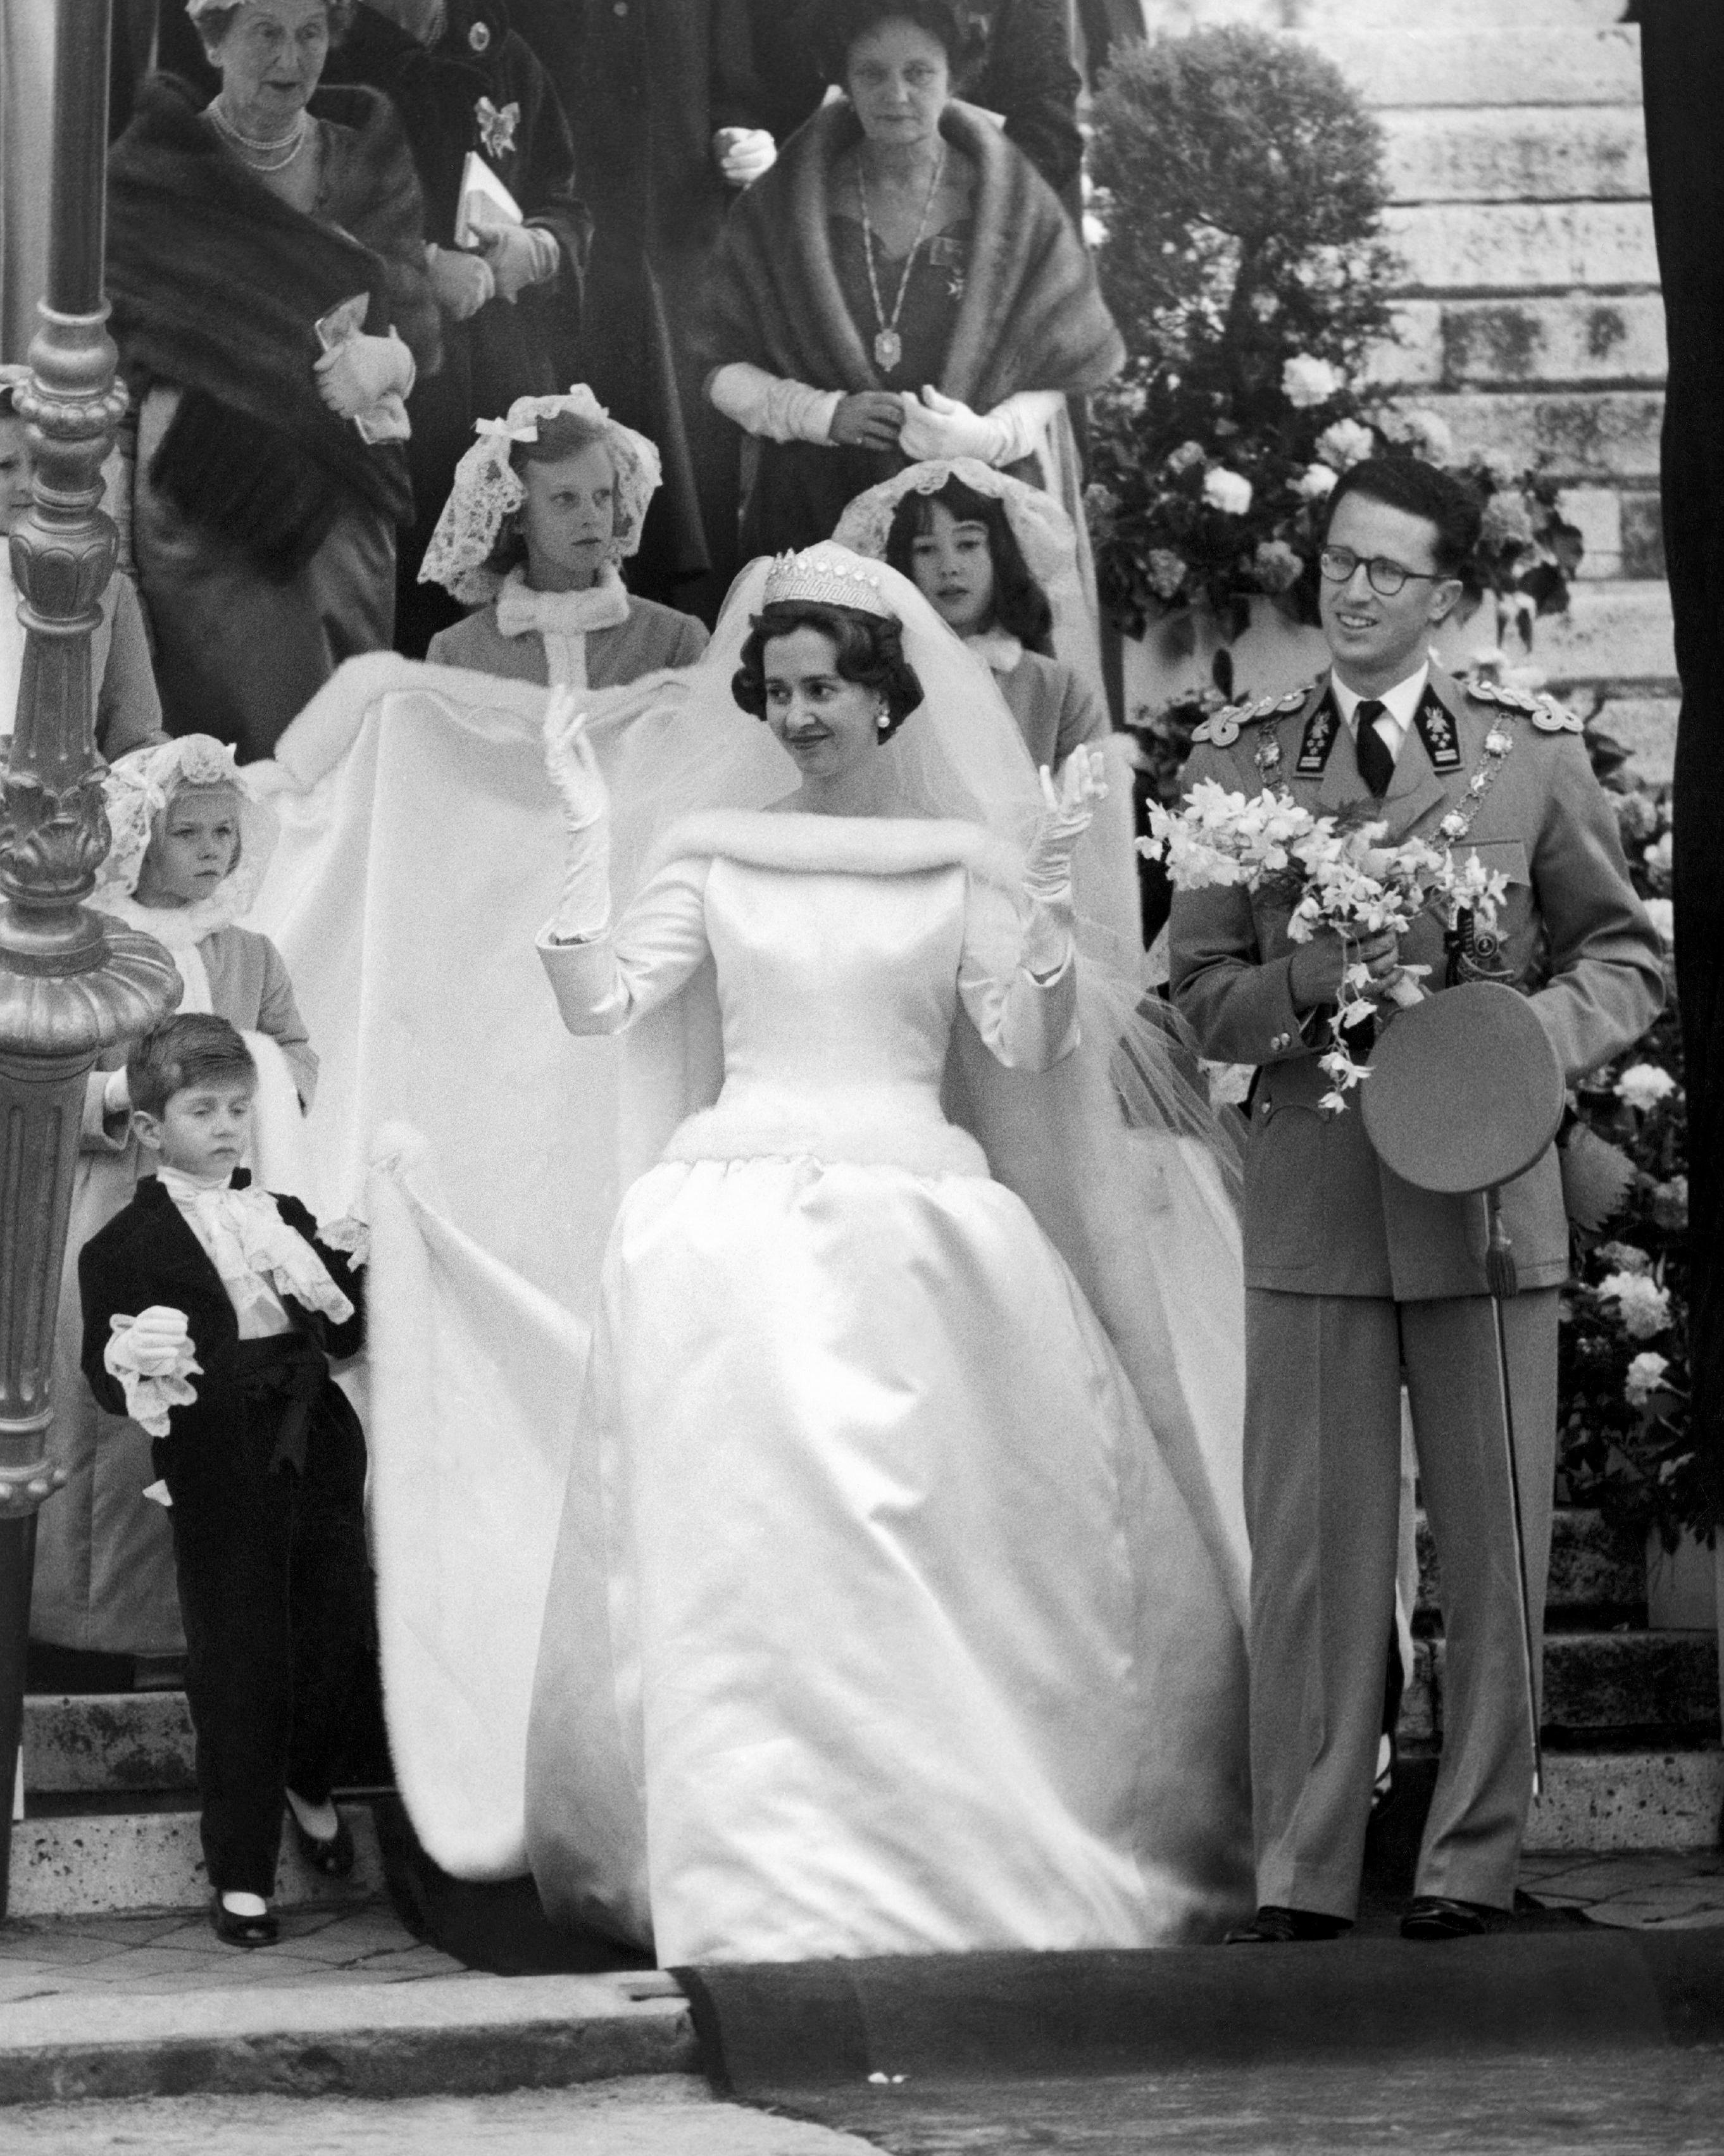 royal-wedding-dress-queen-fabiola-belgium-106752023-1115.jpeg